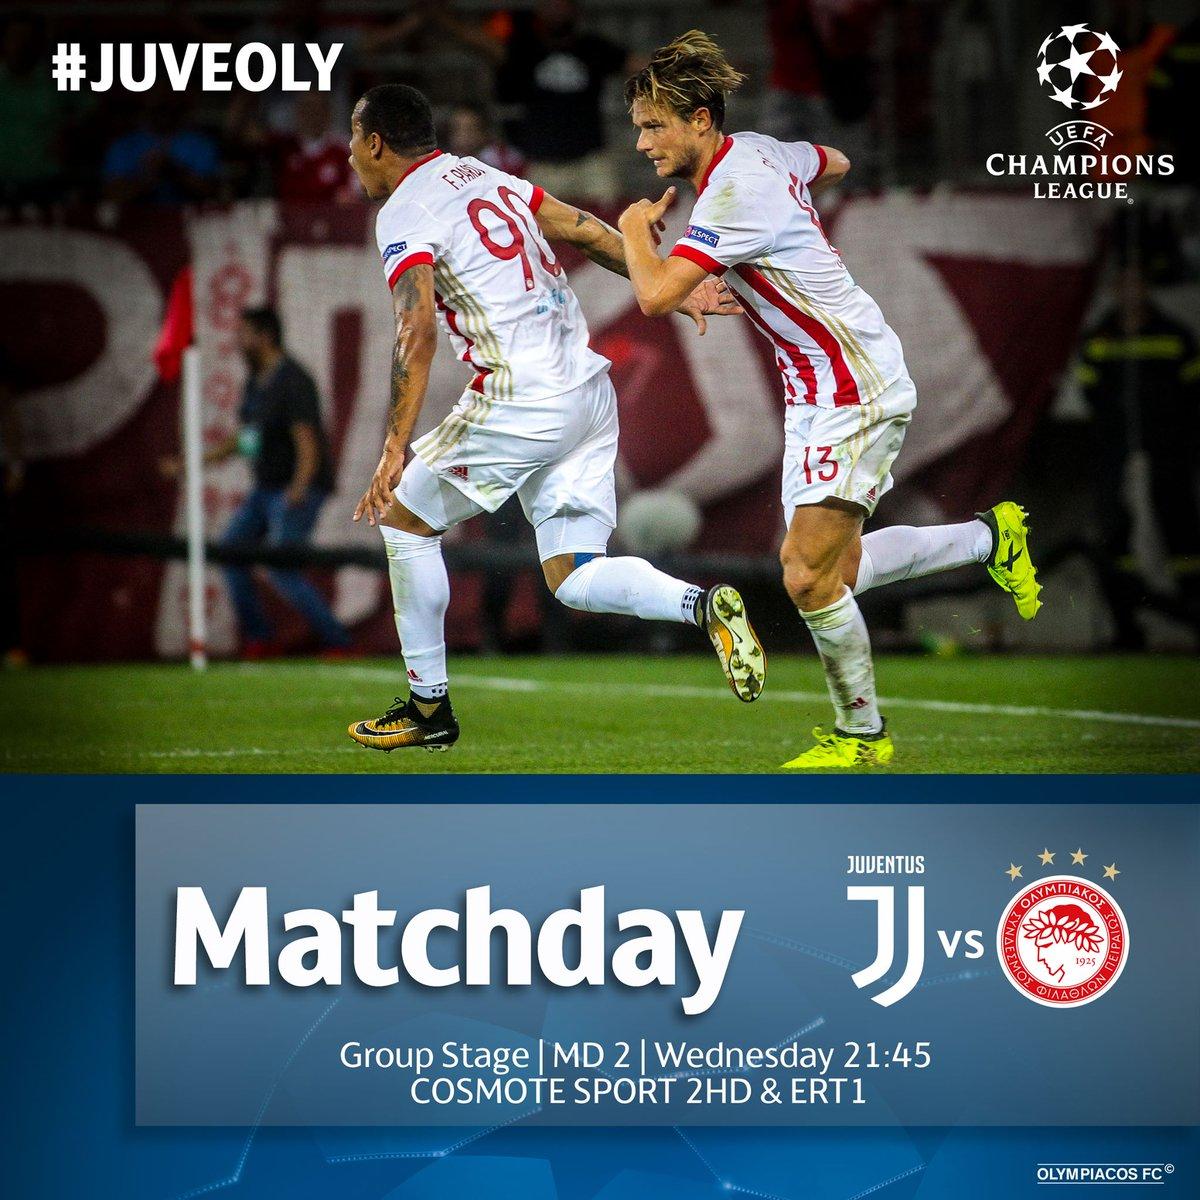 Matchday  E2 9a Bd Juventusfc Vs Olympiacos Fc  F0 9f 8f 86 Championsleague  F0 9f 8f A0 Juventus Stadium  E2 8f B0 2145 Gr Time  F0 9f 93 B2 Juveoly